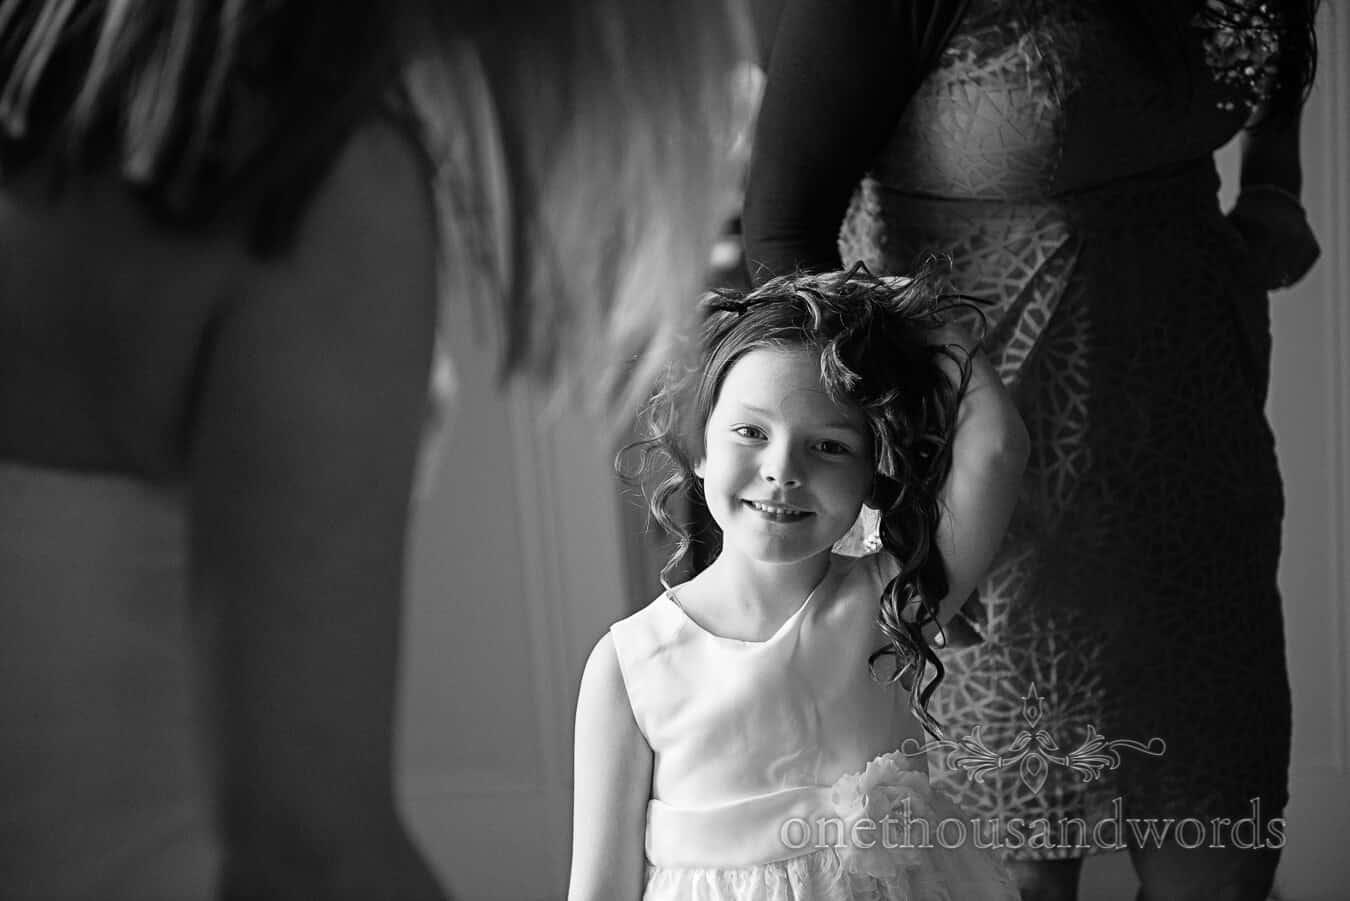 Black and white portrait photograph of flower girl having wedding hair styled